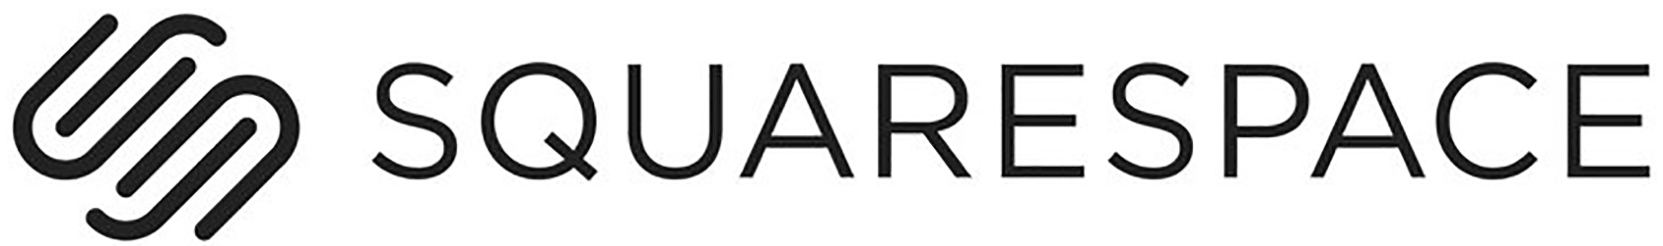 squarespace-logo.jpeg